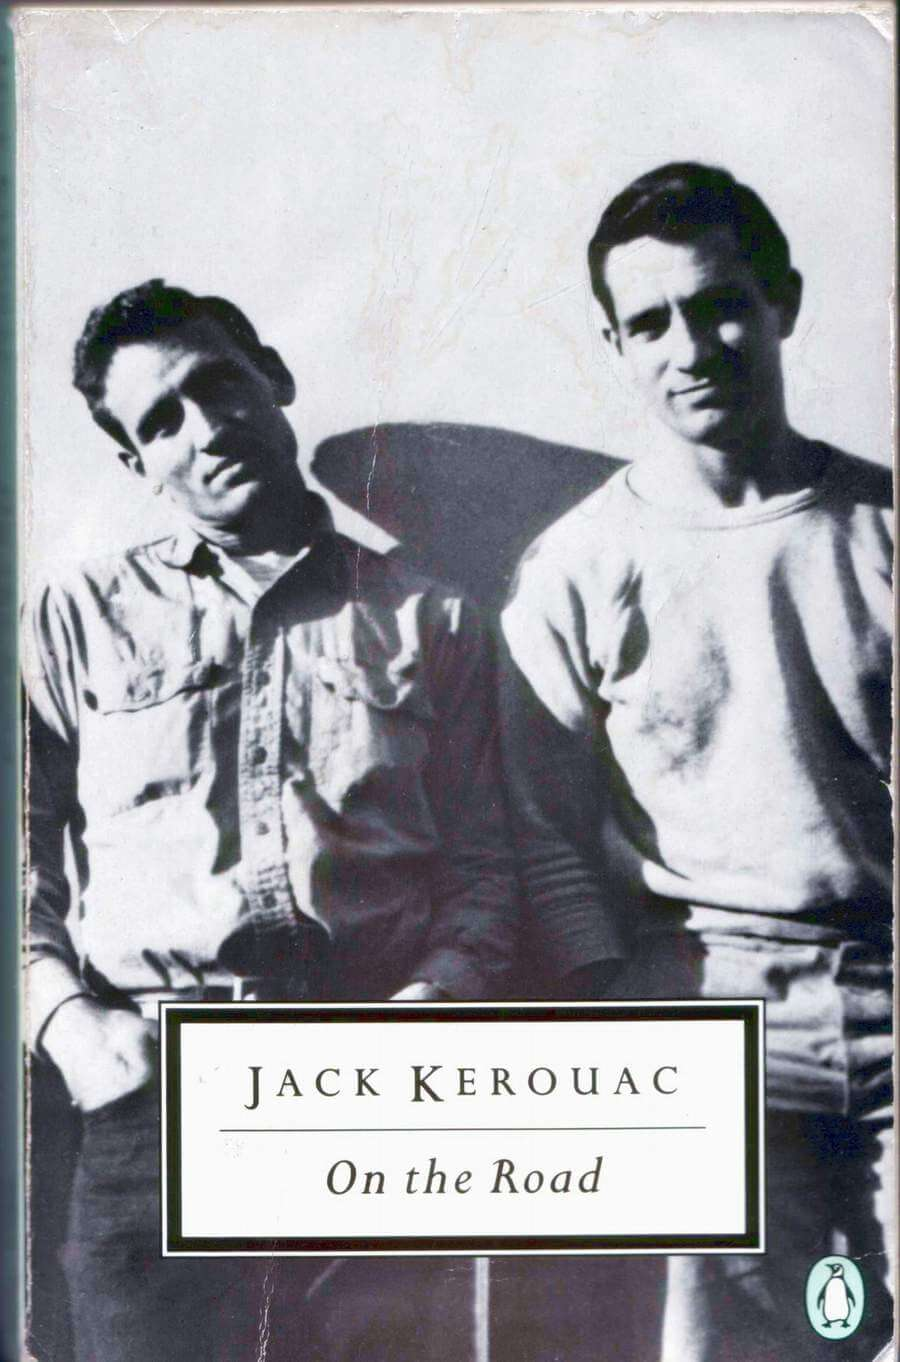 Jack Kerouac On the Road: Essay